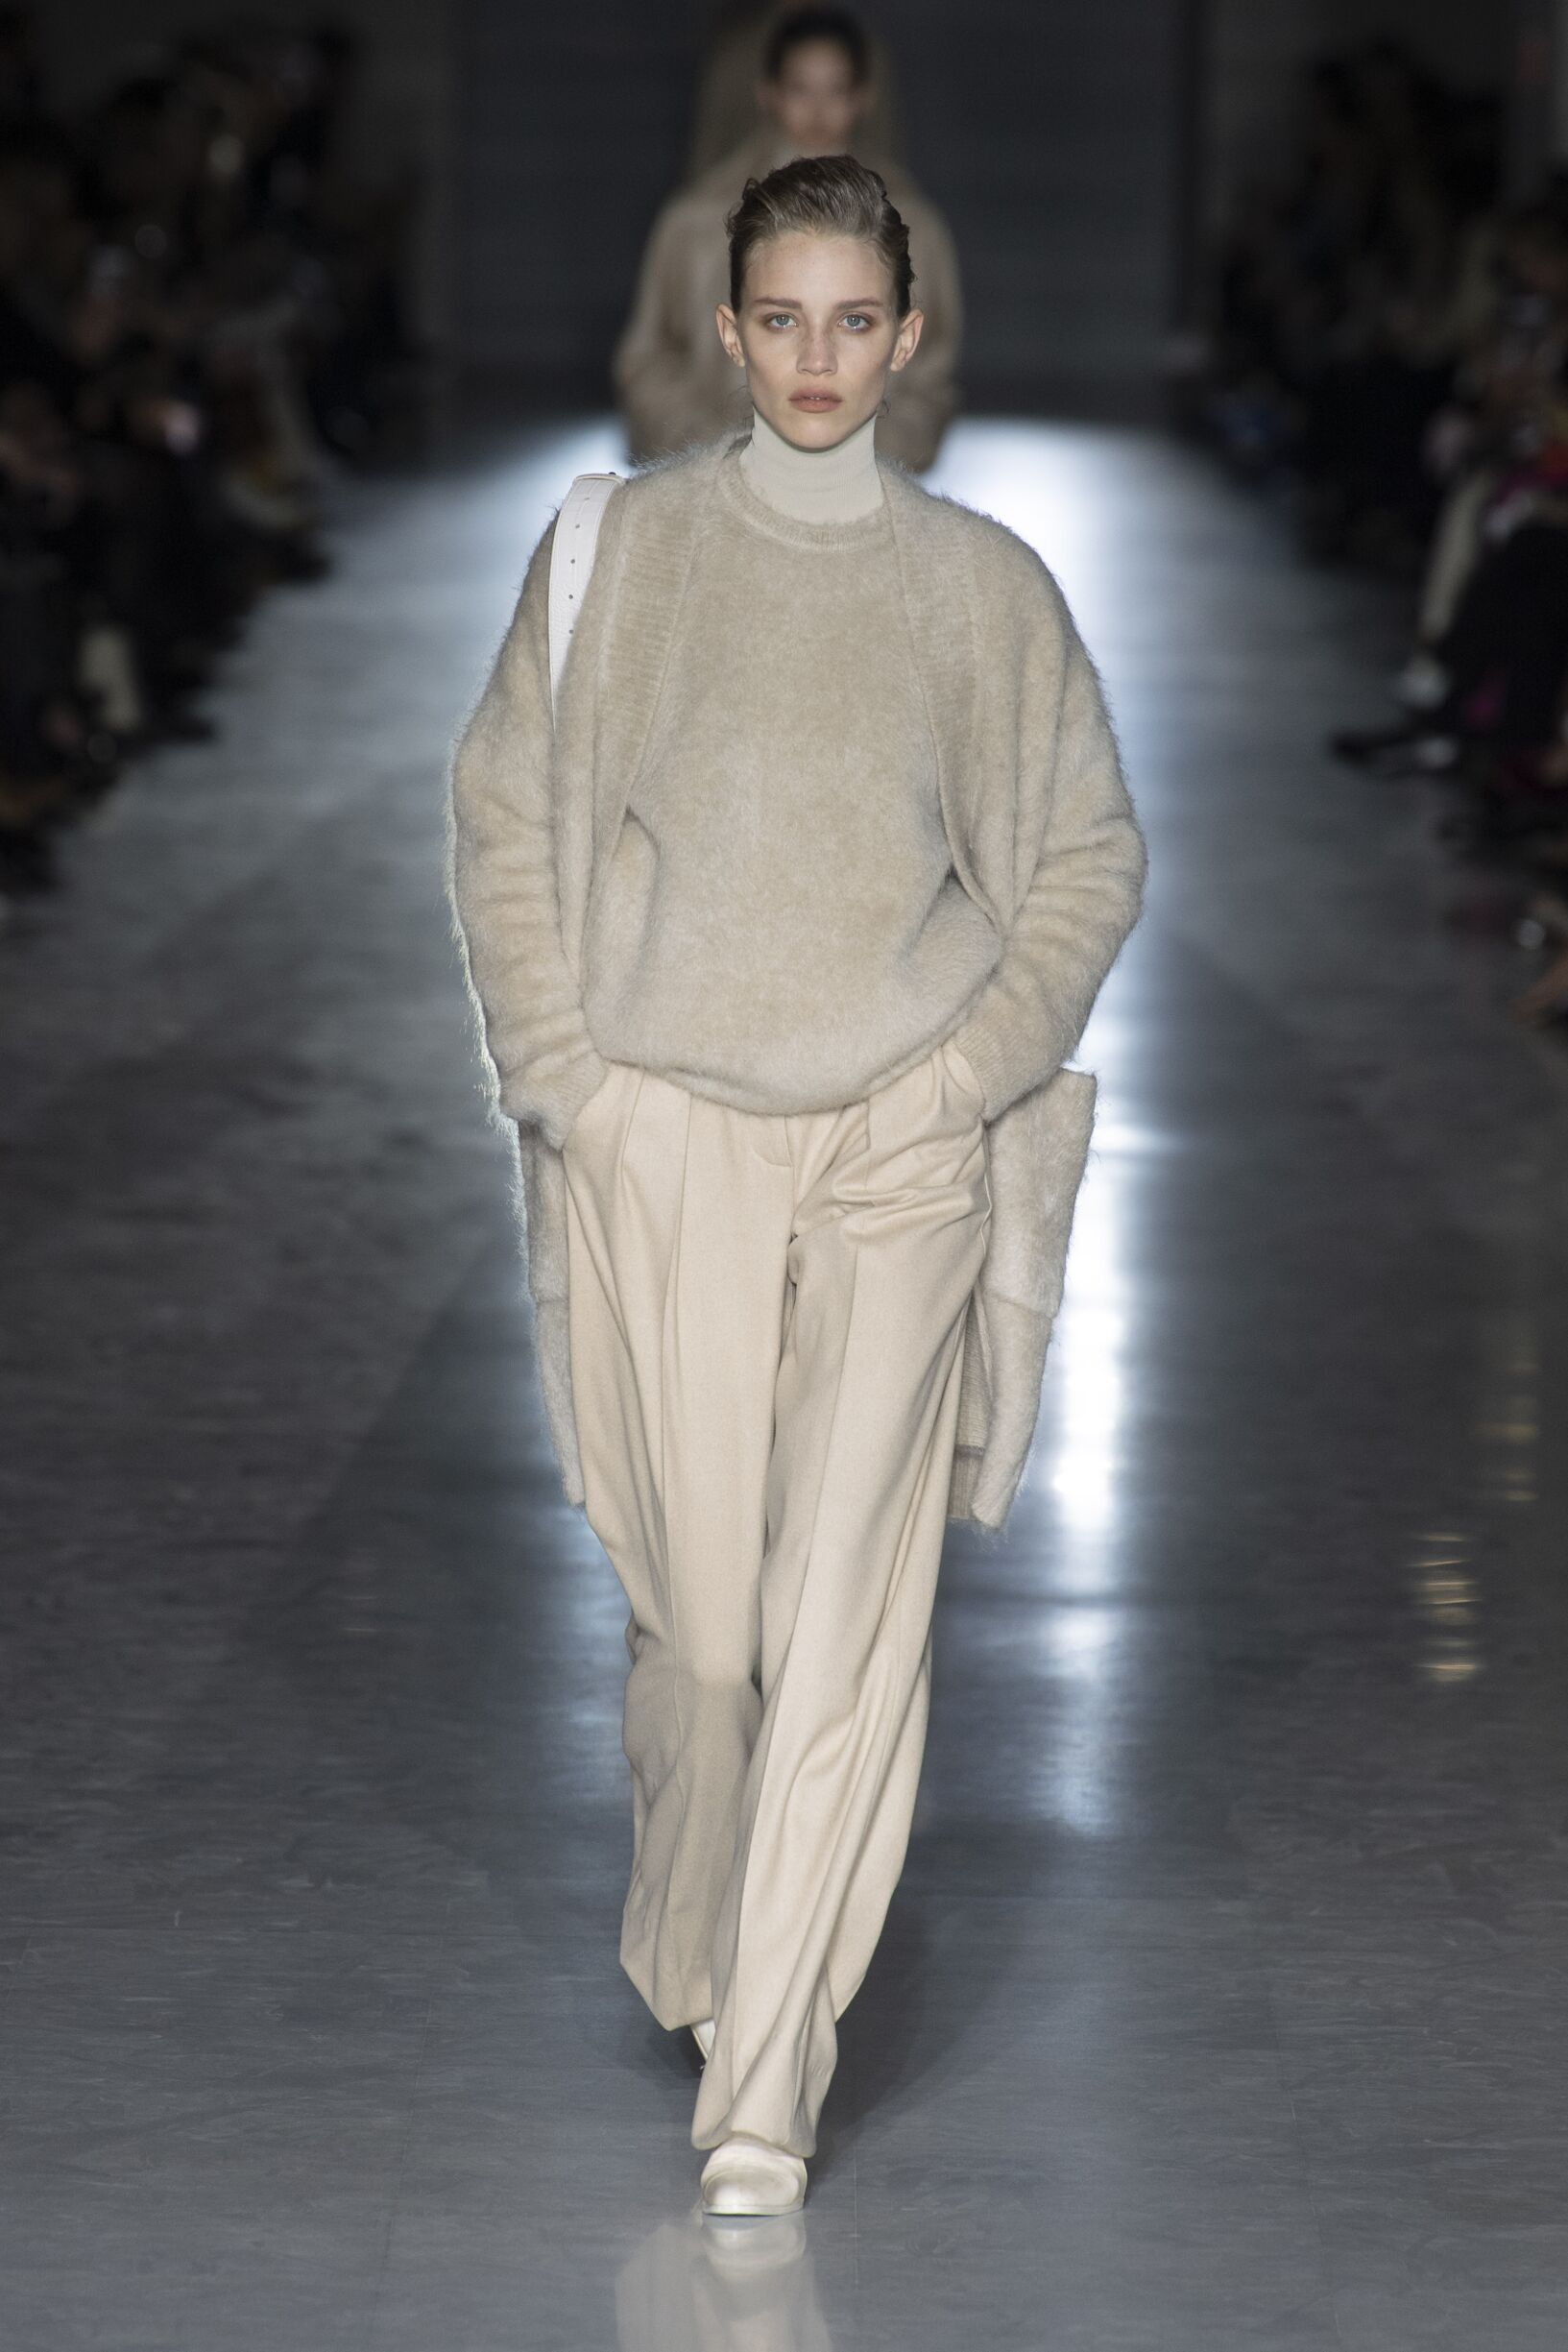 Fall 2019 Womenswear Max Mara